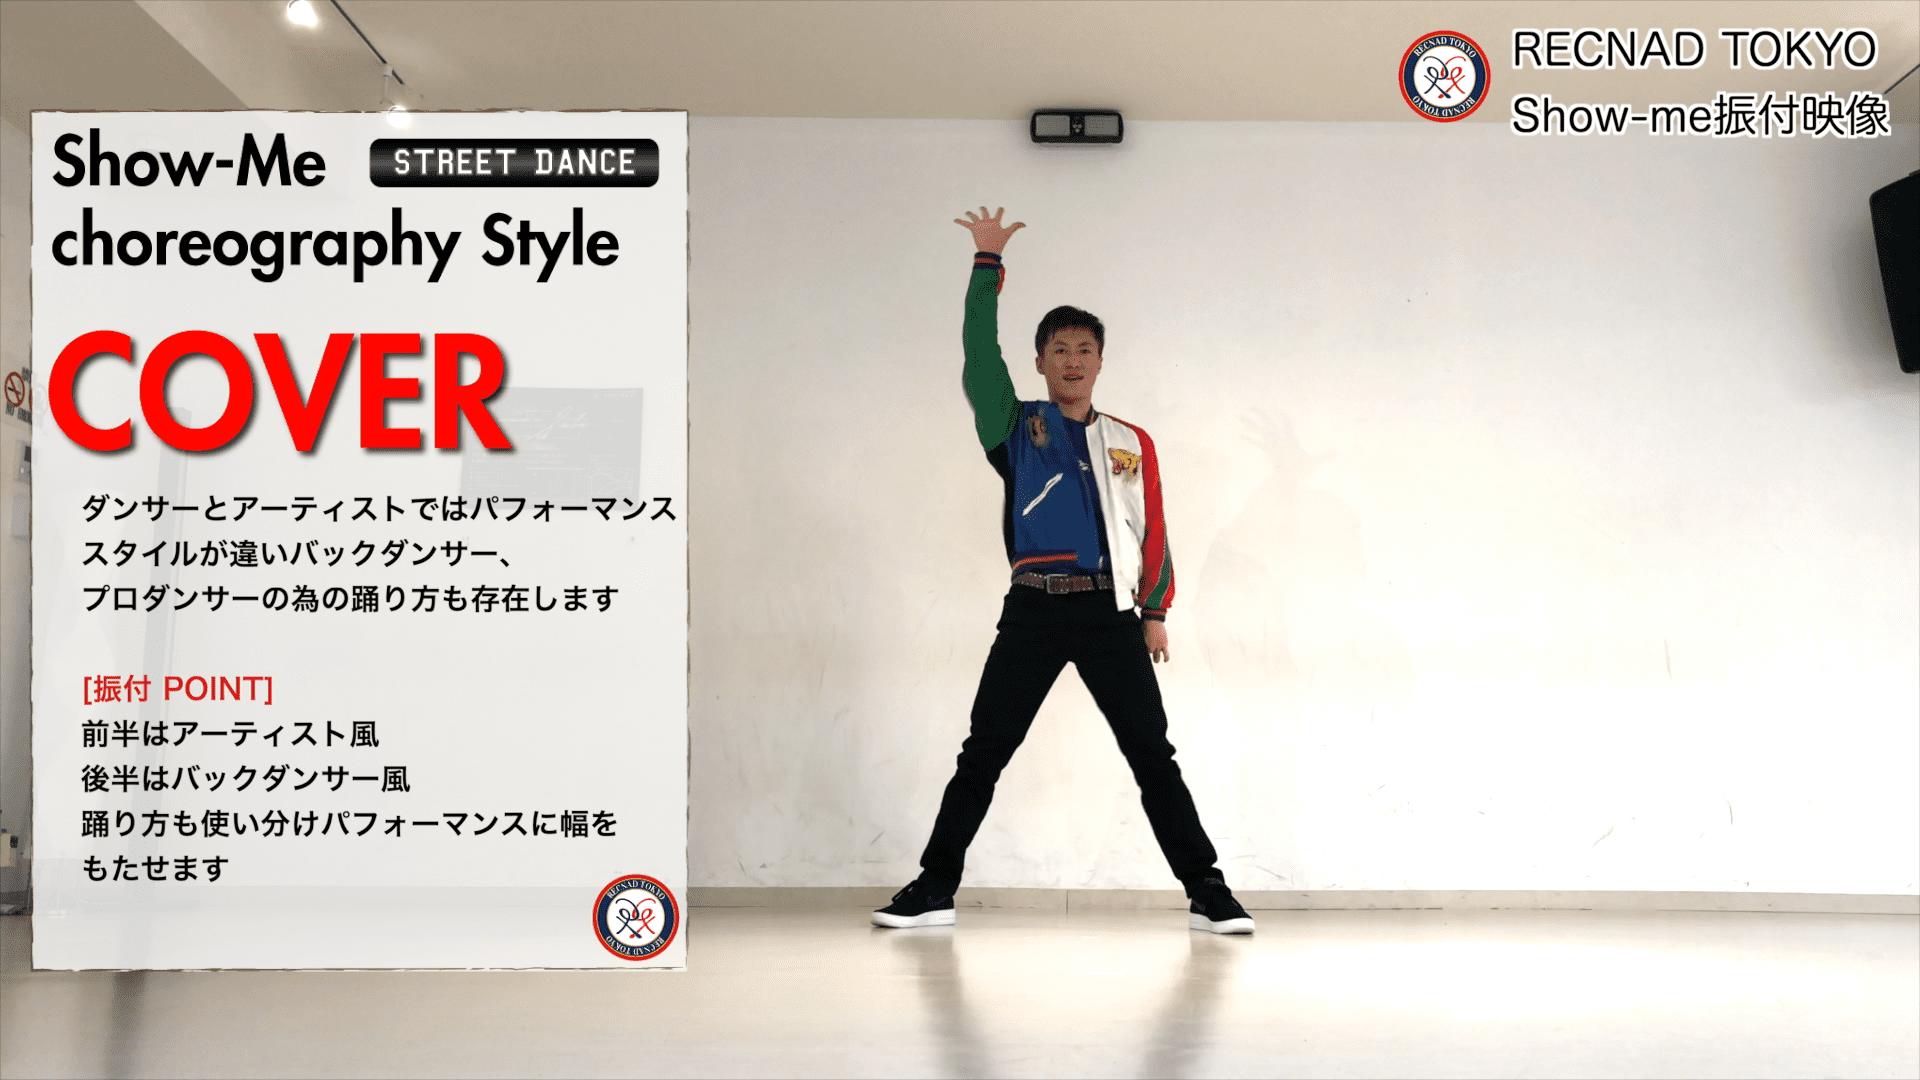 COVER DANCE カバーダンス 振付依頼 振付師キャスティング用 | ストリートダンス ジャンル別 振り付け